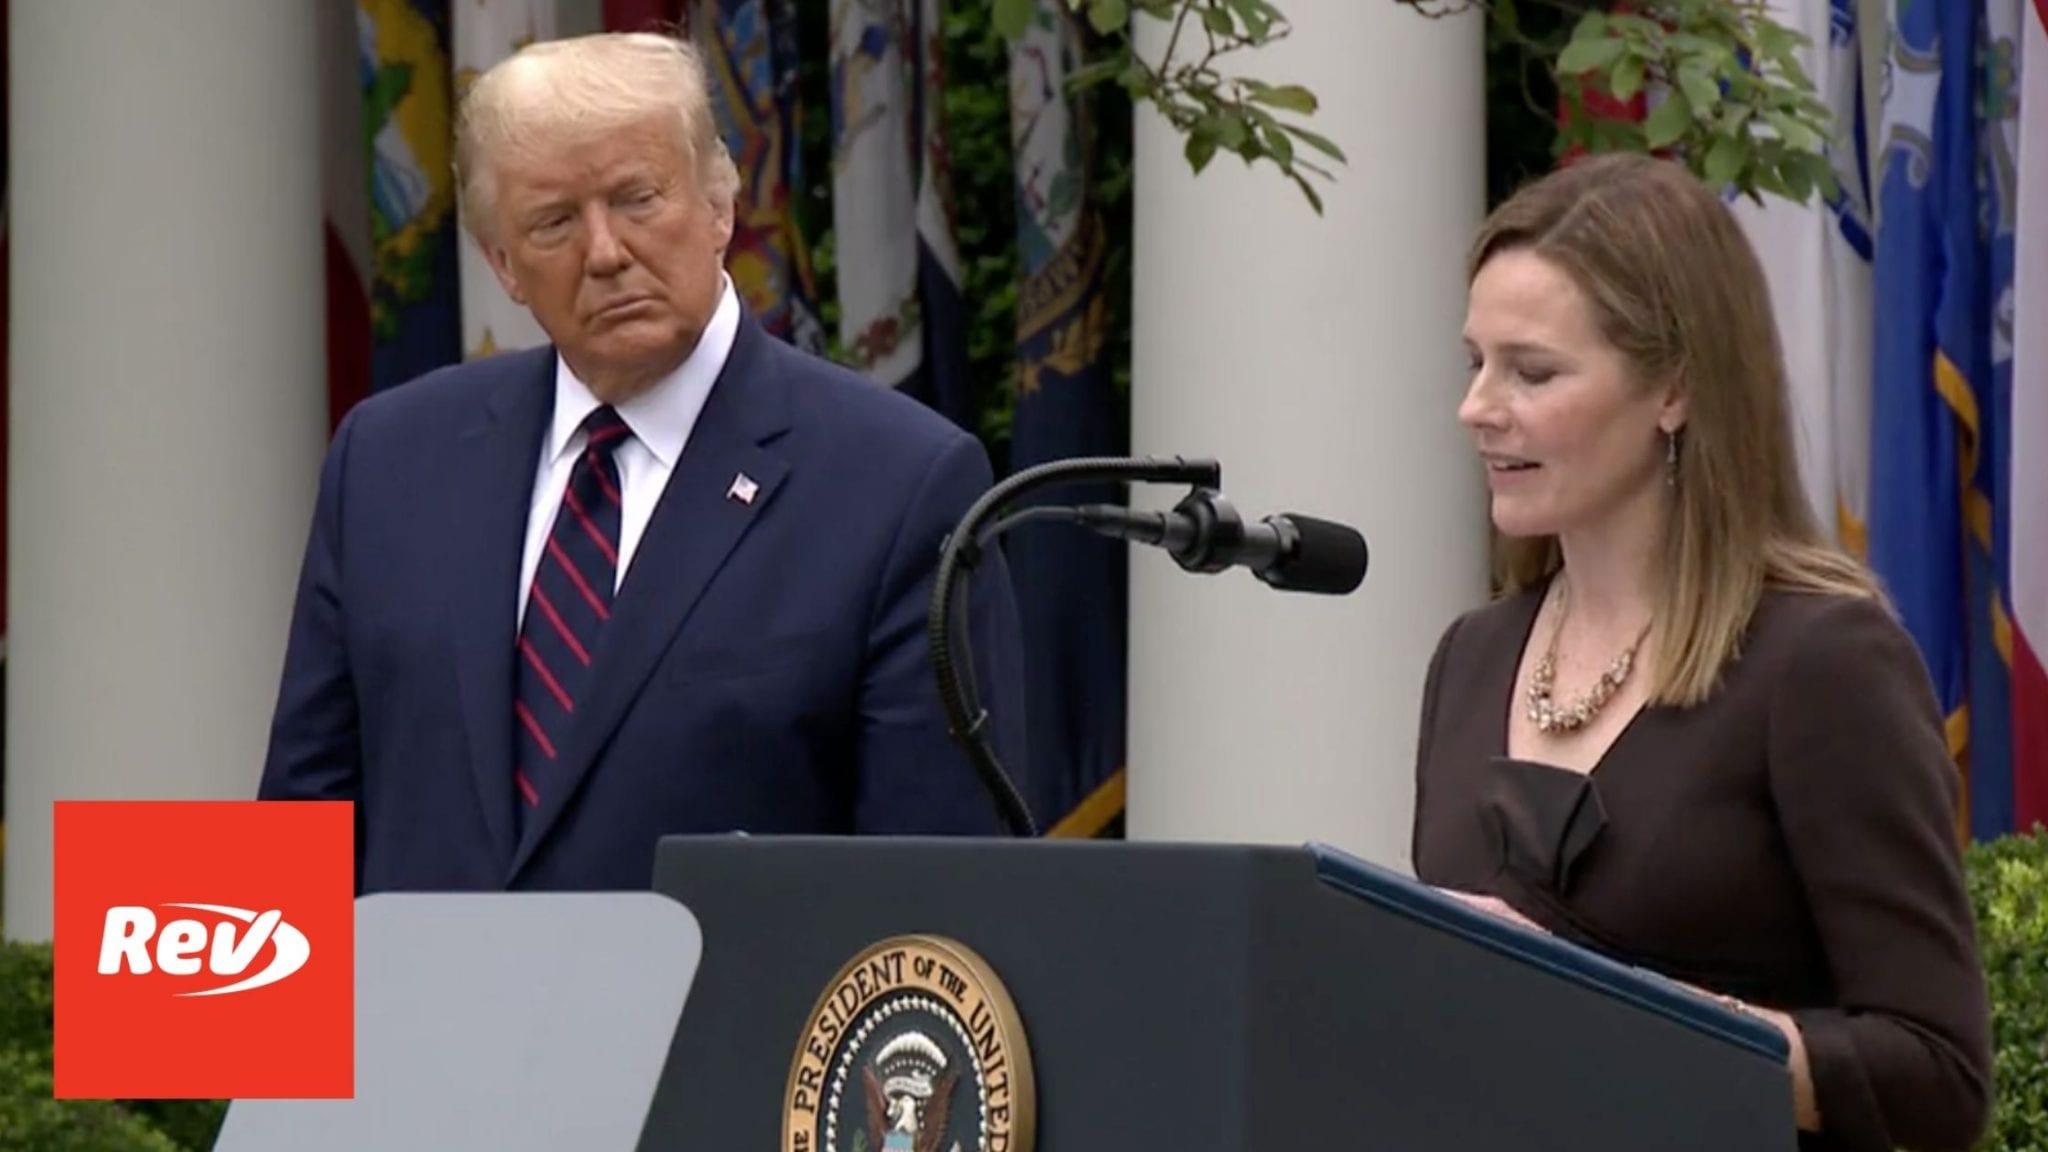 Donald Trump SCOTUS Nomination of Amy Coney Barrett Transcript